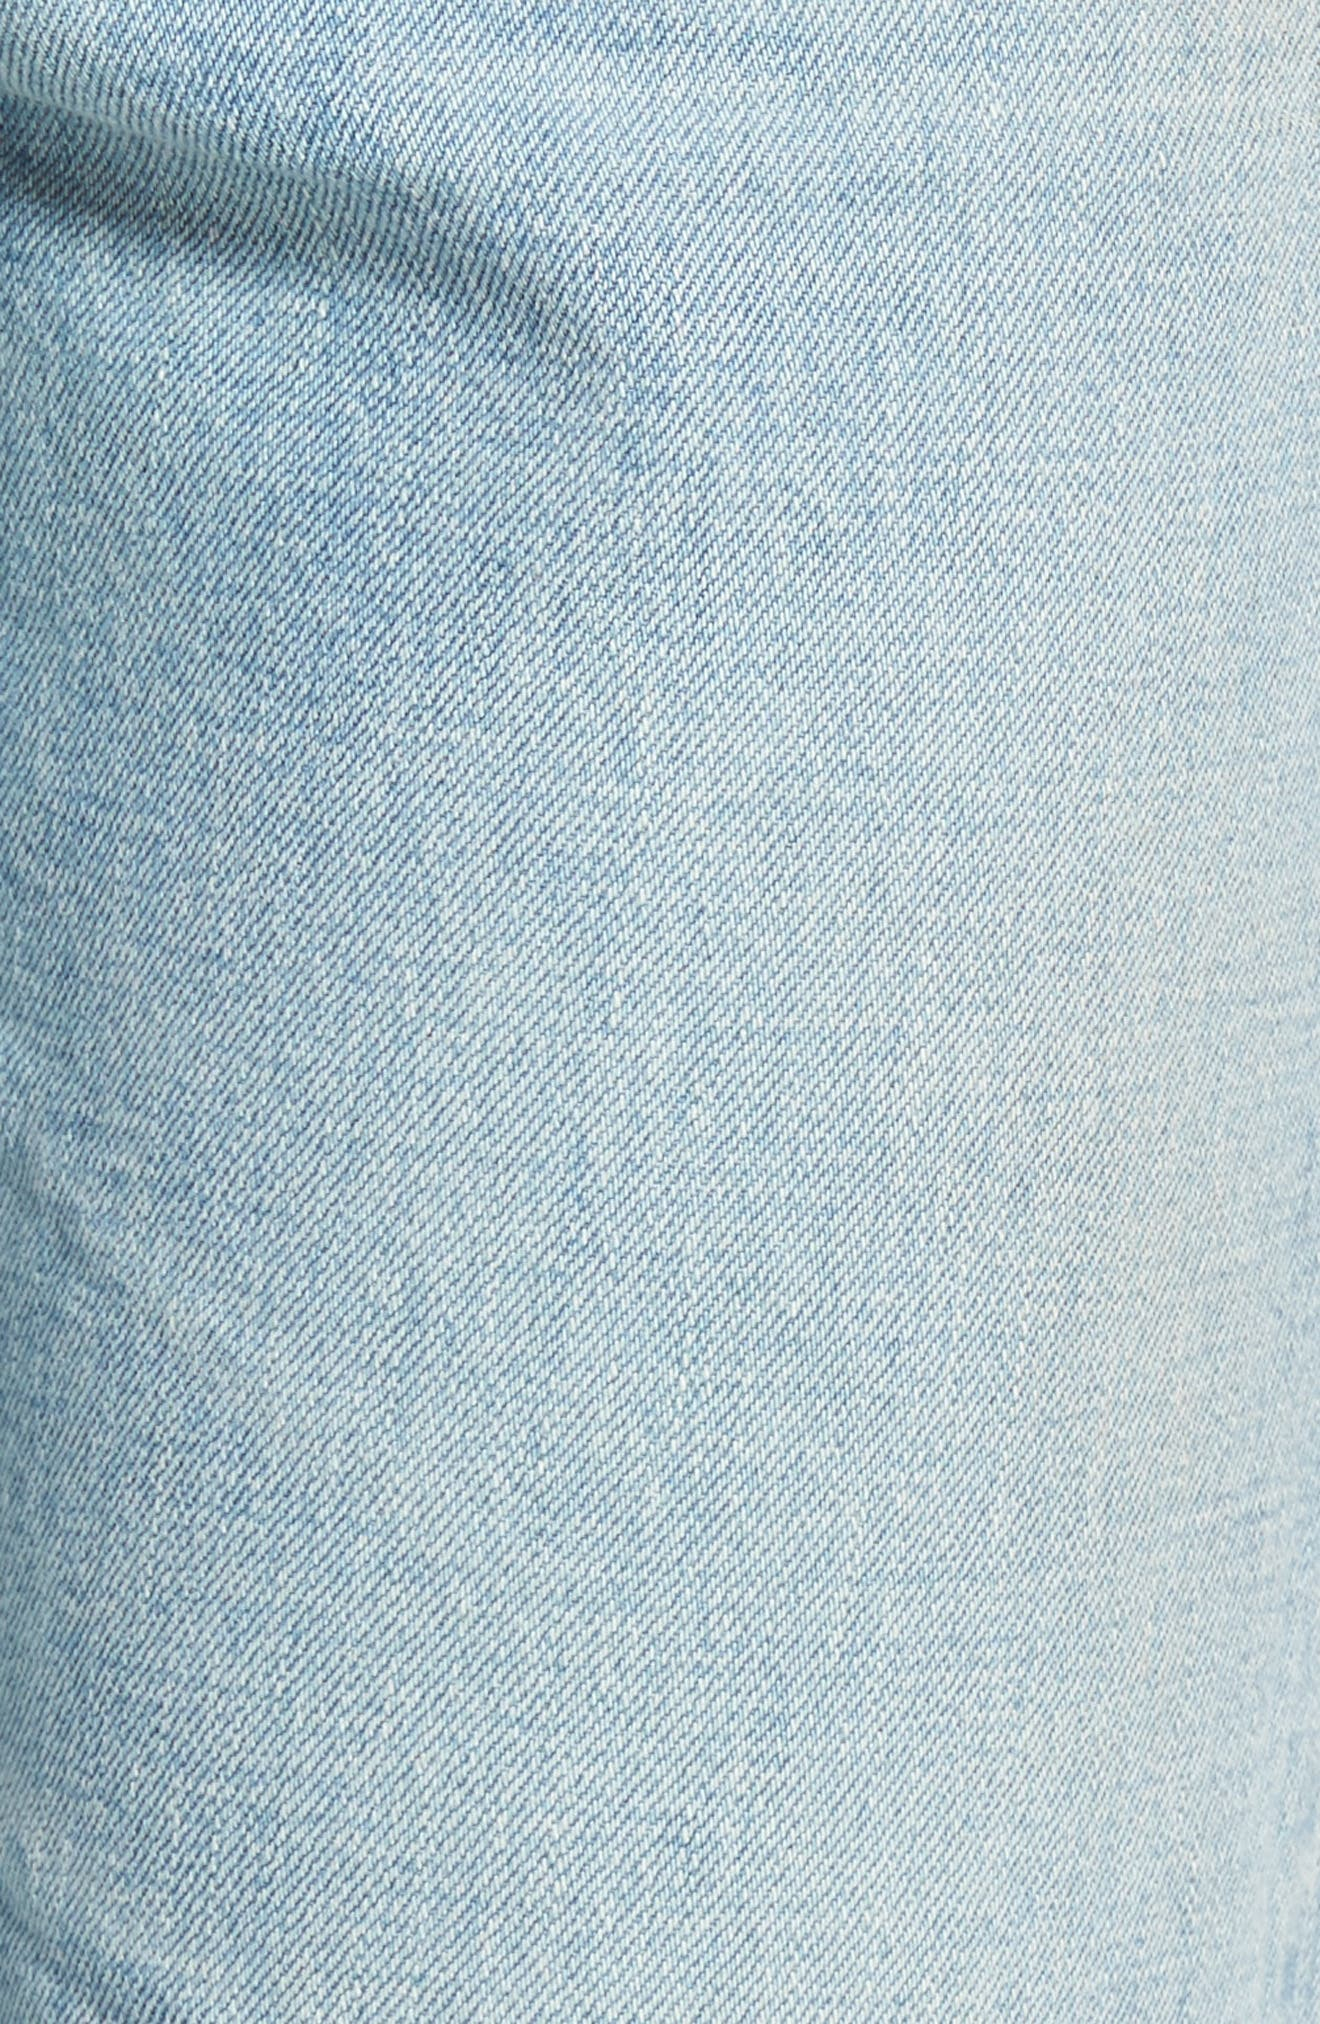 The Rhett Vintage High Waist Crop Jeans,                             Alternate thumbnail 15, color,